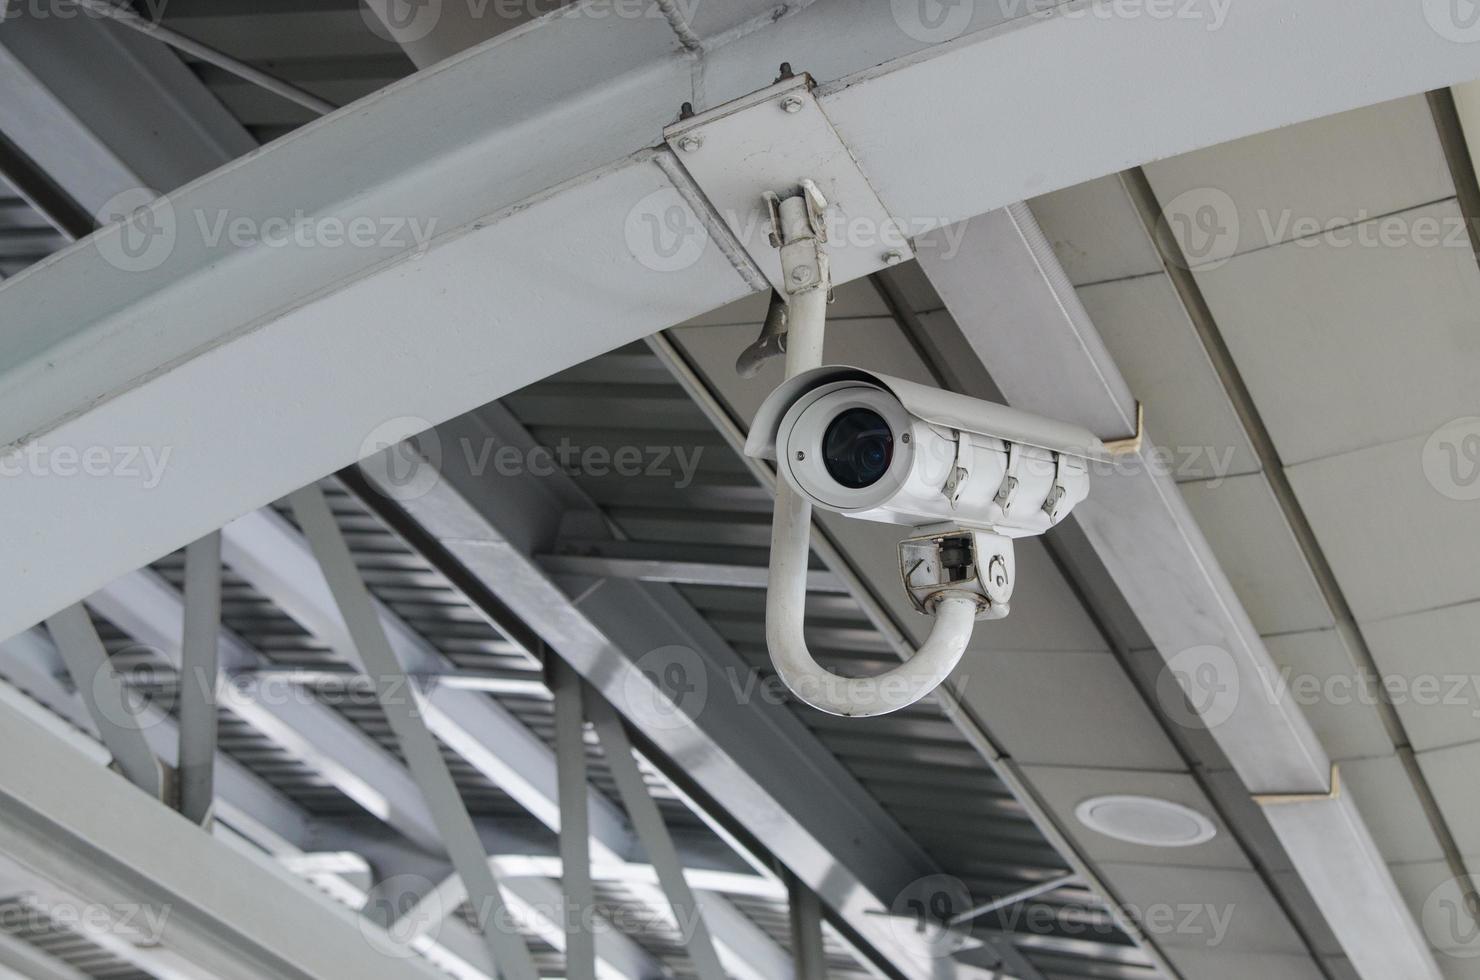 bewakingscamera cctv foto